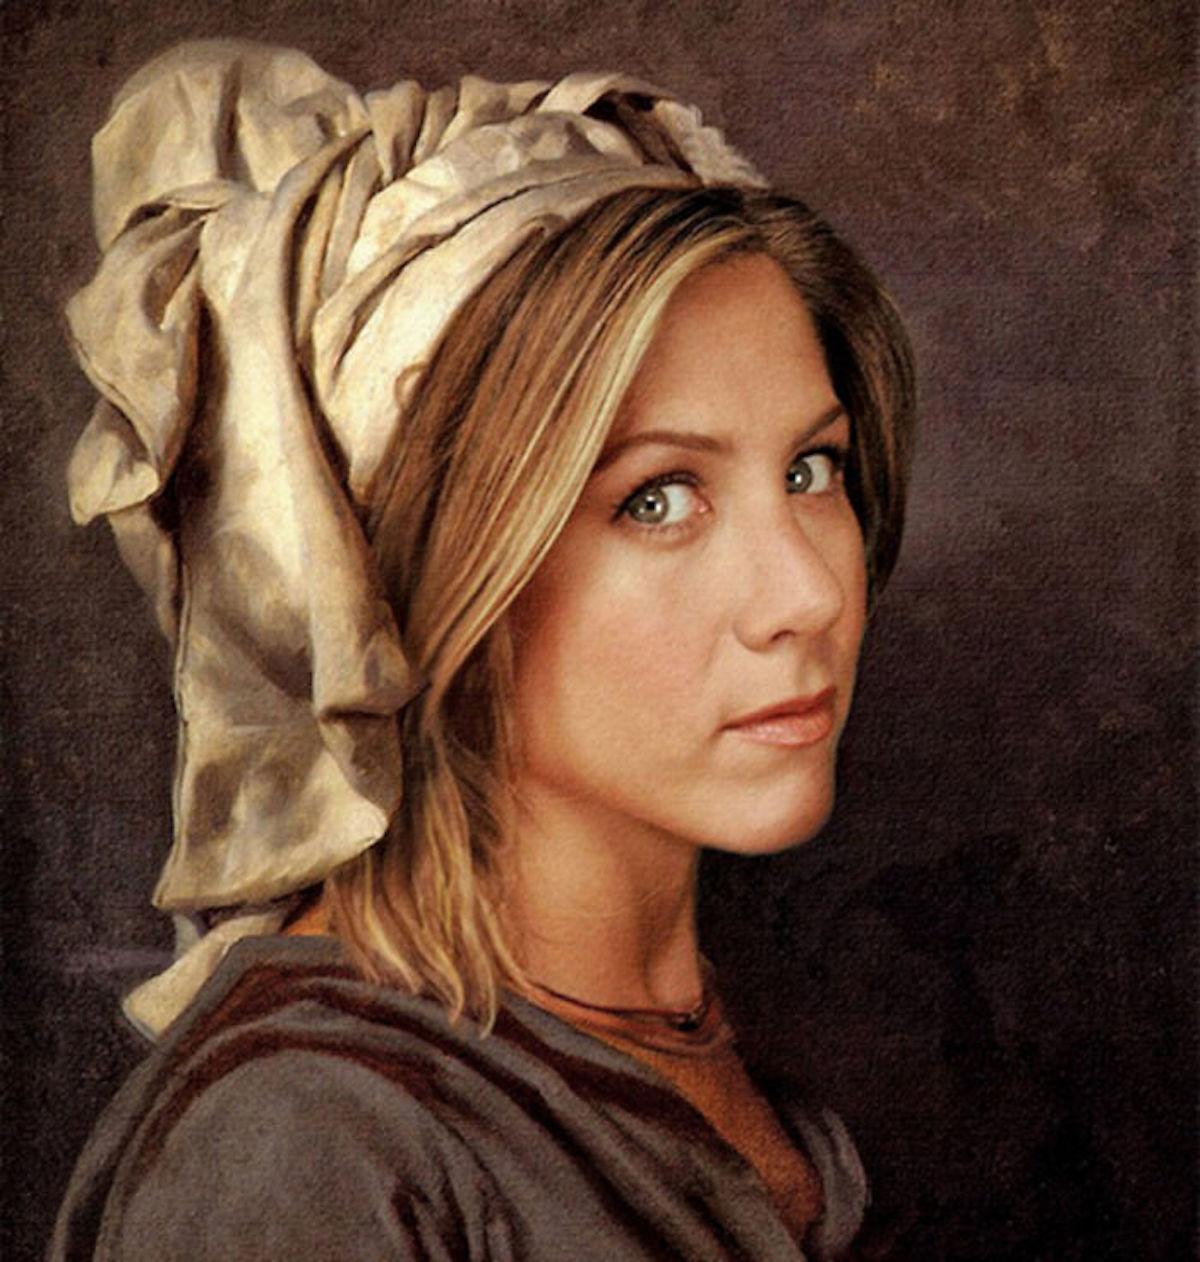 Jennifer Aniston Art Digital Design Crowd